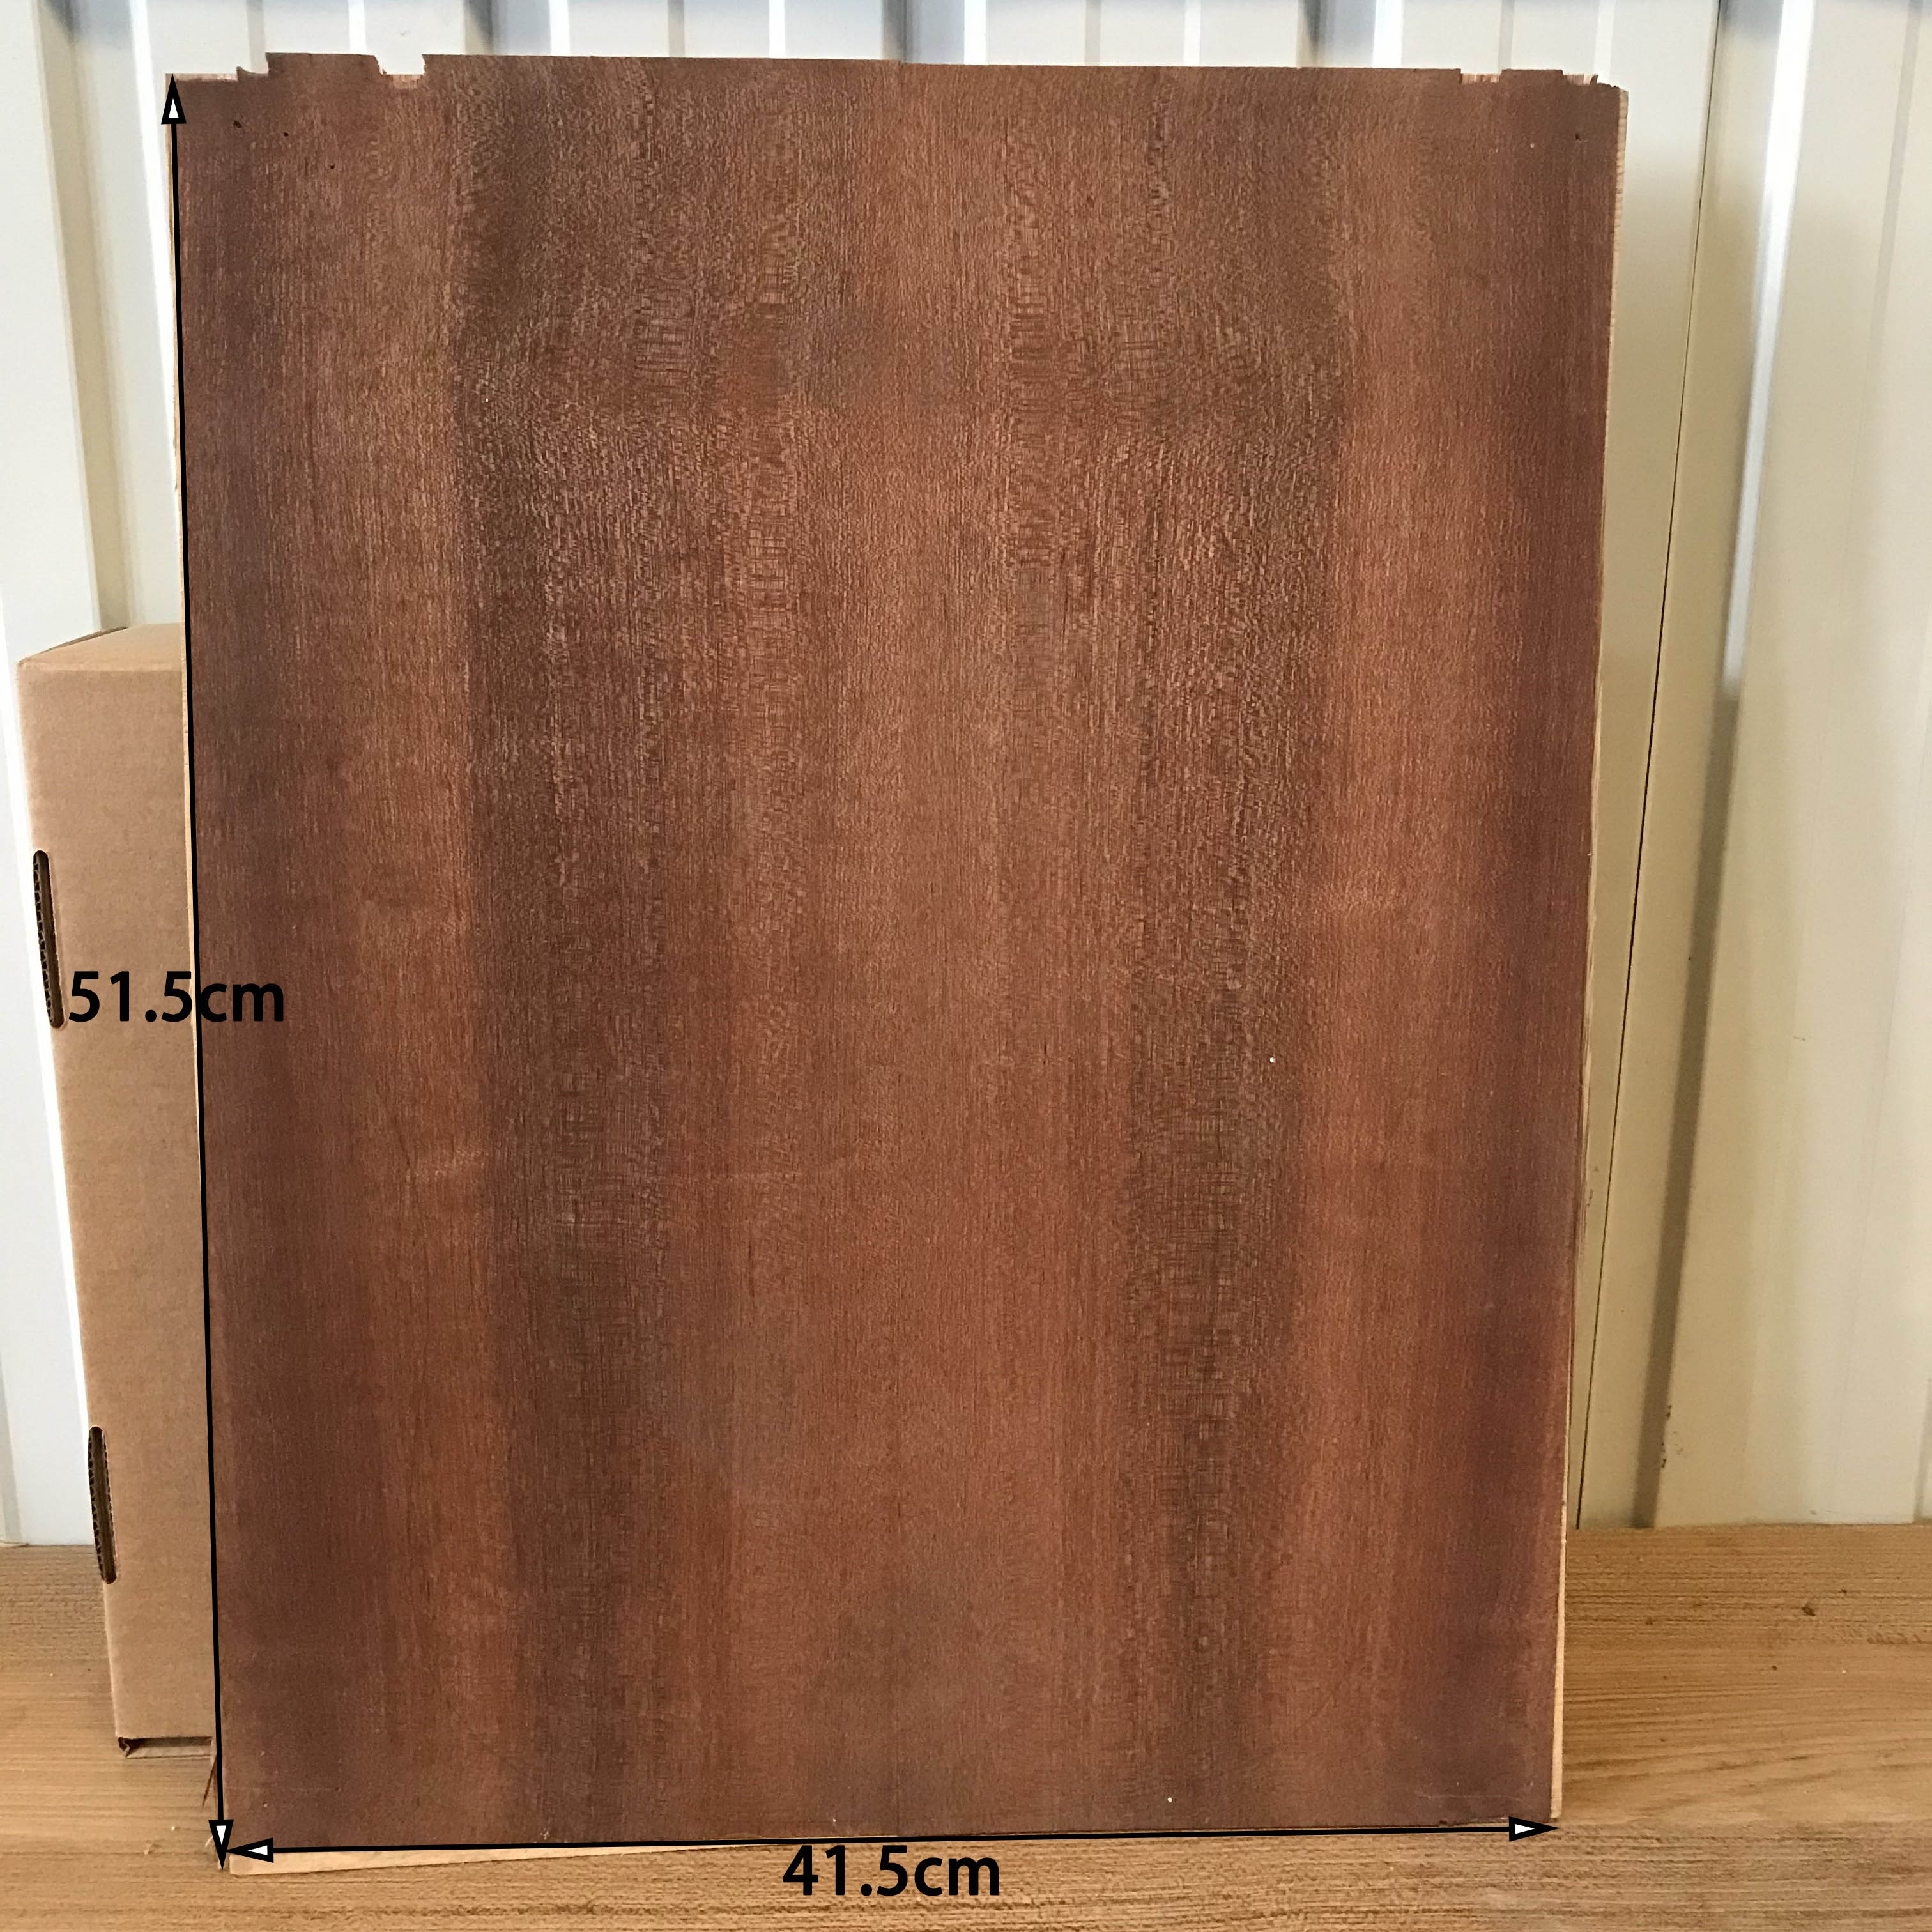 1Set Rosewood Veneer Guitar Back And Side Plate High Quality Guitar Panel Guitarra Making Material and 41inch Guitar Neck enlarge